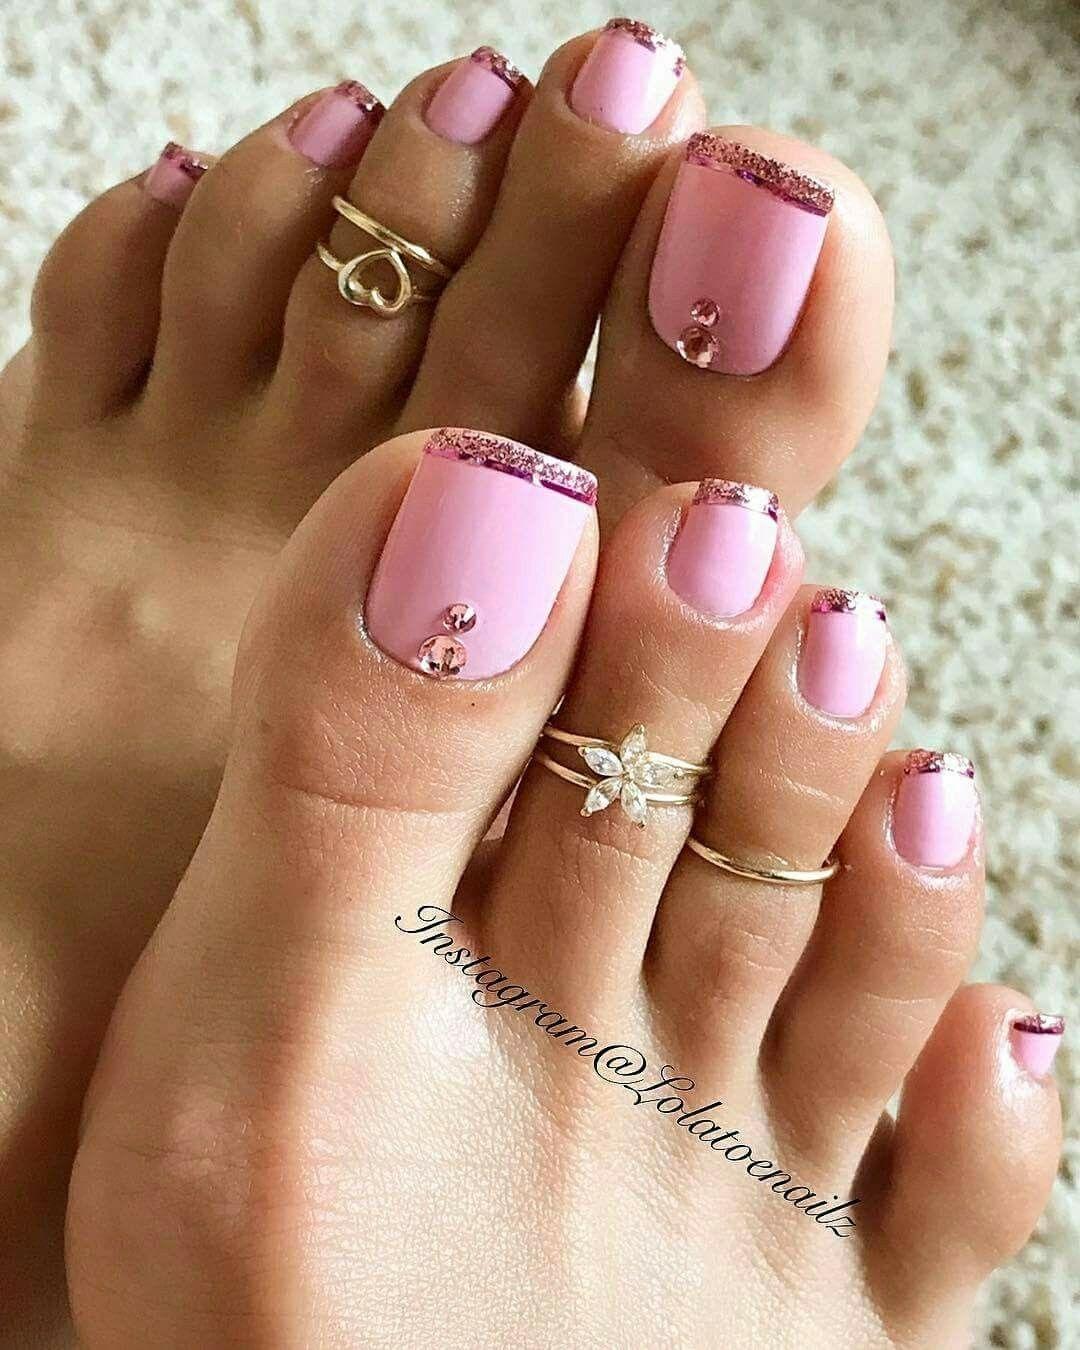 Pedicure nails in pinterest uña decoradas manicura and